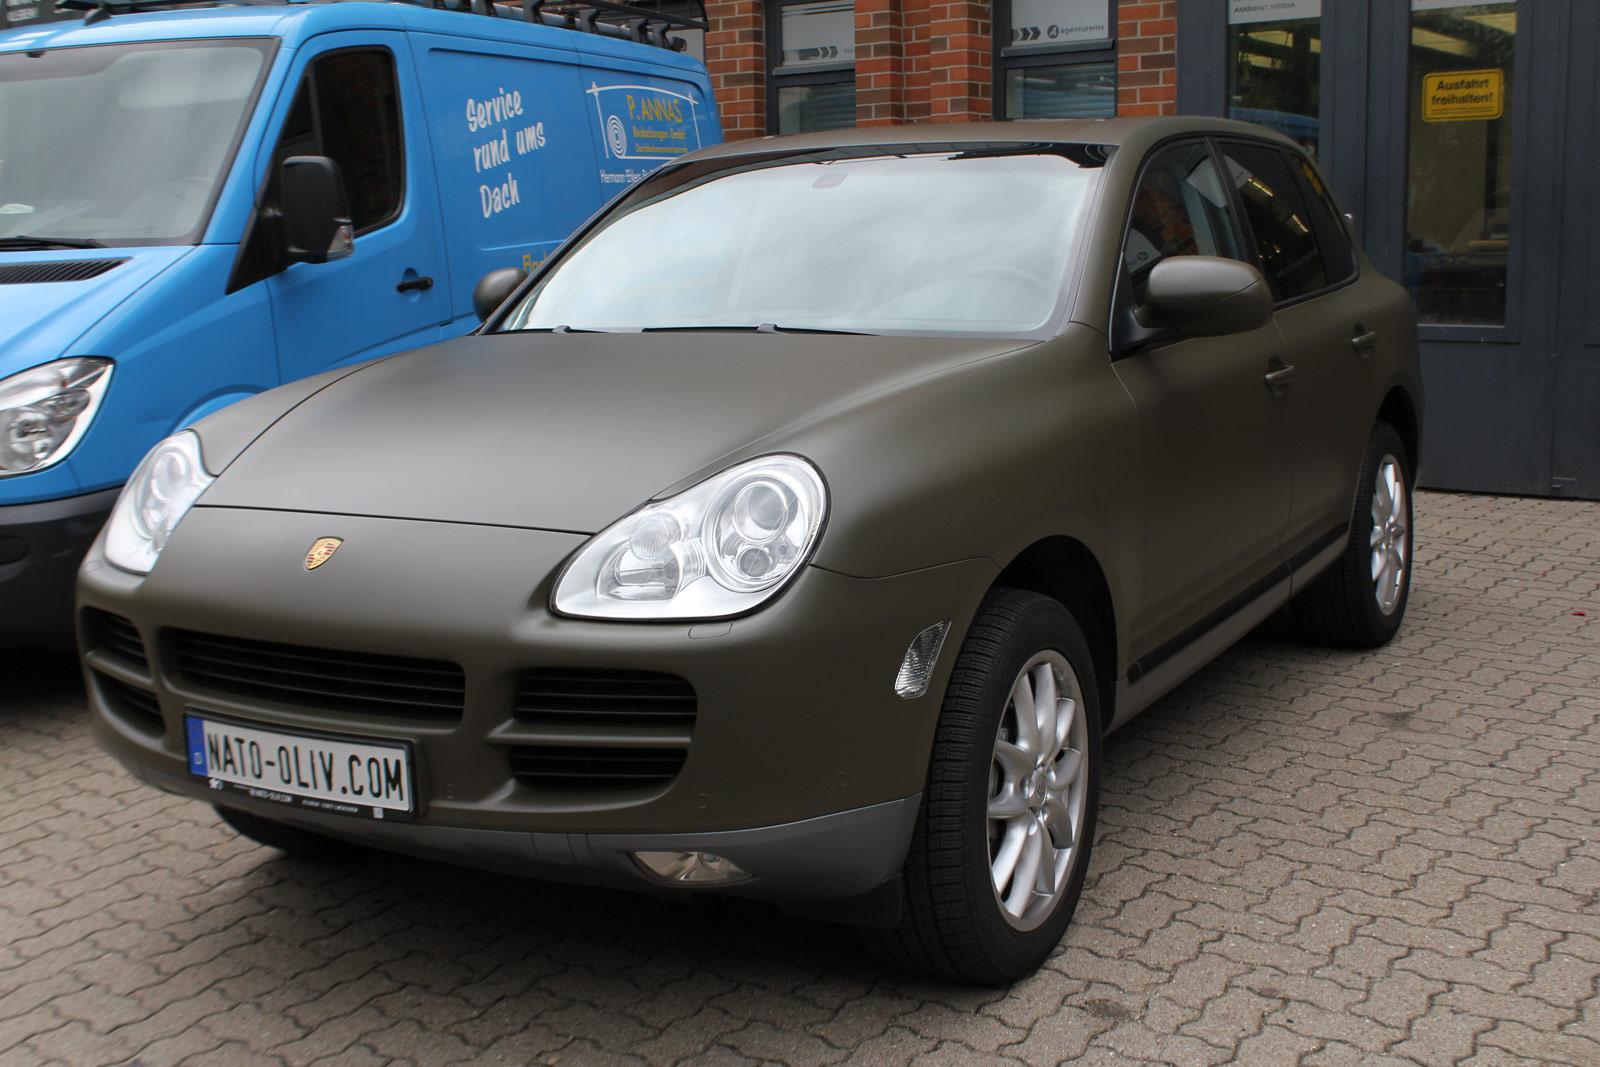 Porsche_Cayenne_Folierung_Nato-Oliv_Matt_14